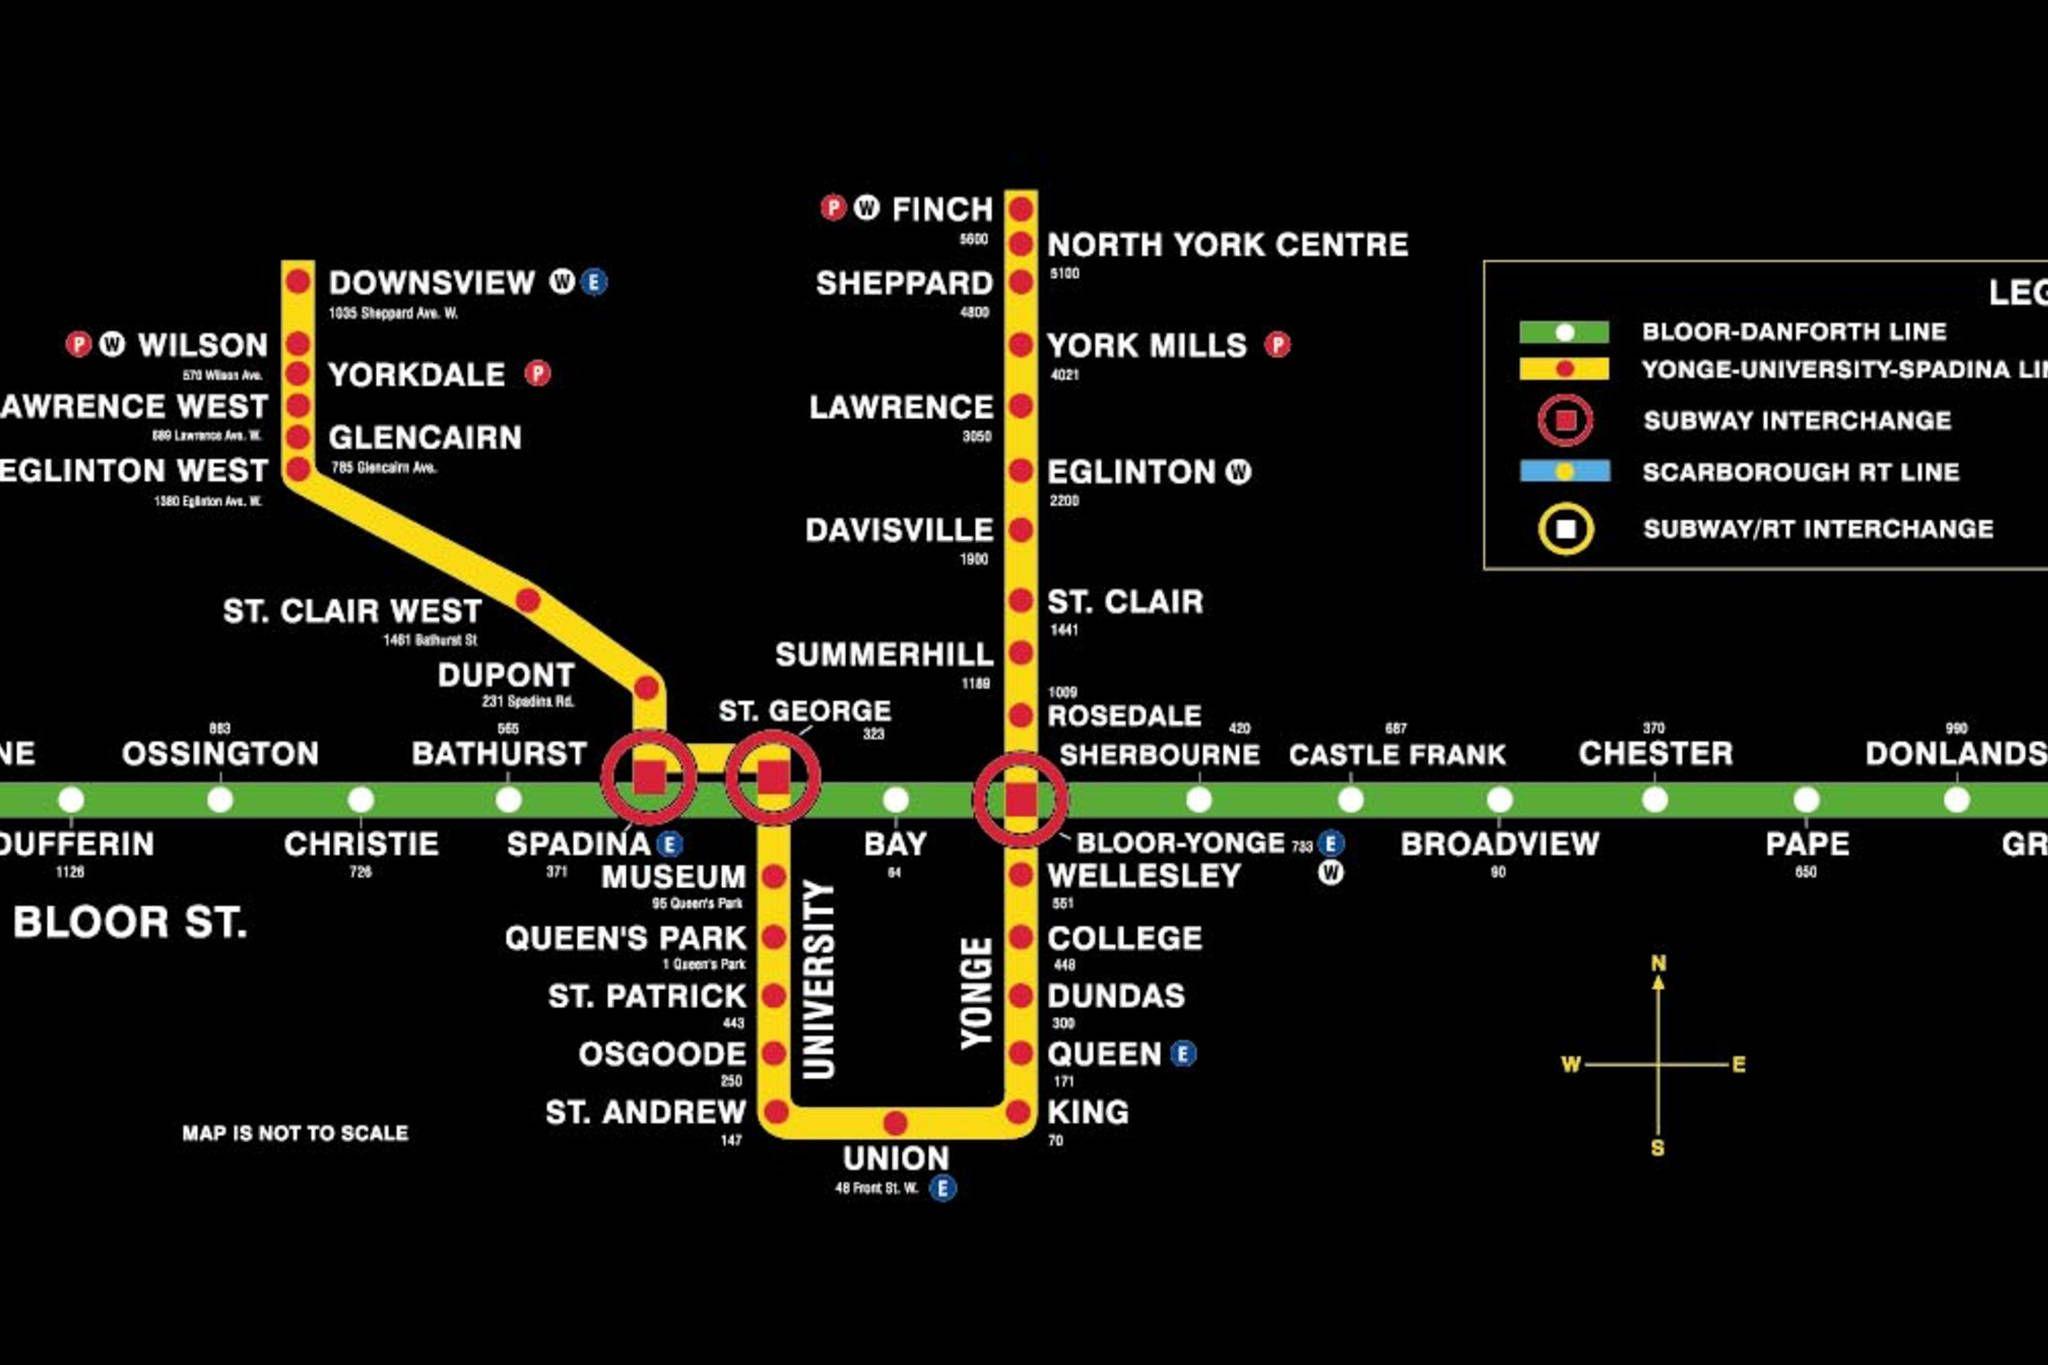 Ttc Subway Map Toronto.Toronto Subway Map Toronto Subway Subway Map Toronto Map